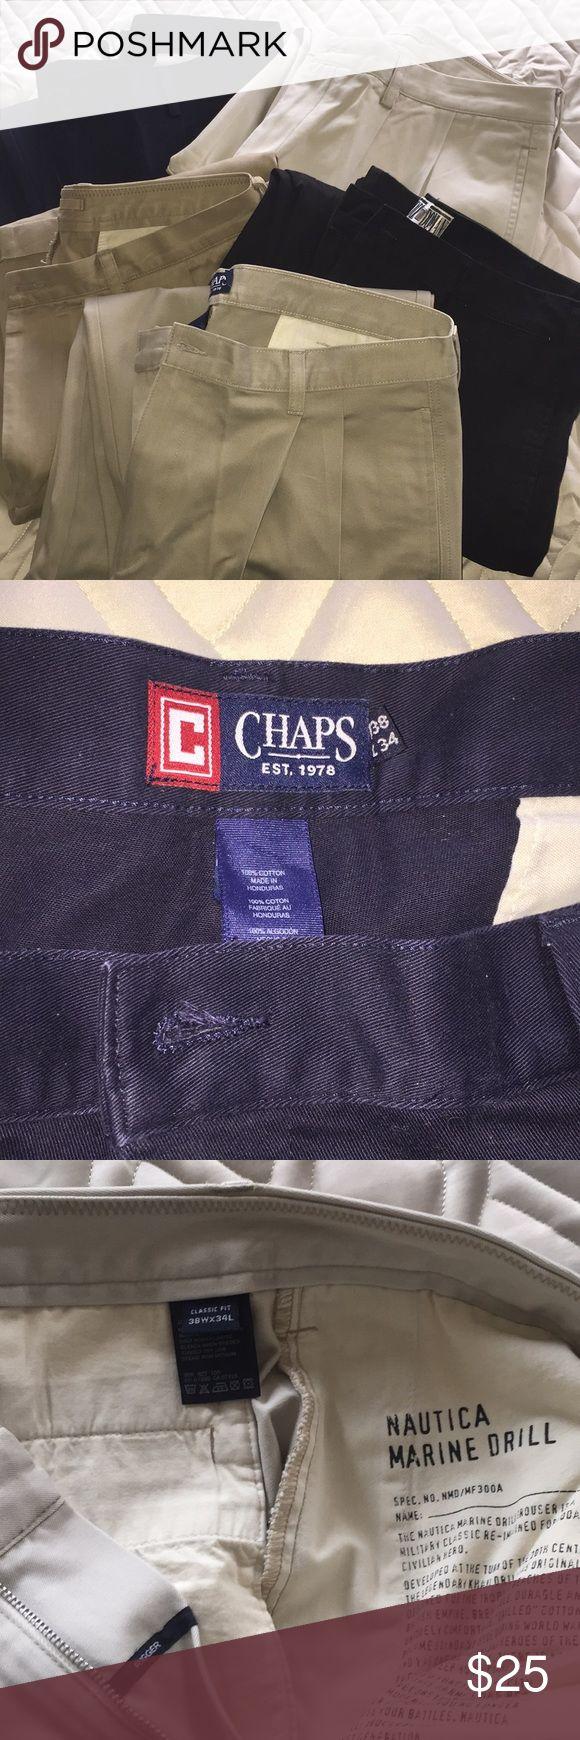 Men's Khakis Bundle 5 pair.  All size 38Wx34L.  Like new condition.  1 navy, 1 black, 1 khaki, 2 light khaki.  2 Nautica brand, 2 Chaps brand, 1 Eddie Domani brand.  All have cuffed bottom. Chaps Pants Chinos & Khakis